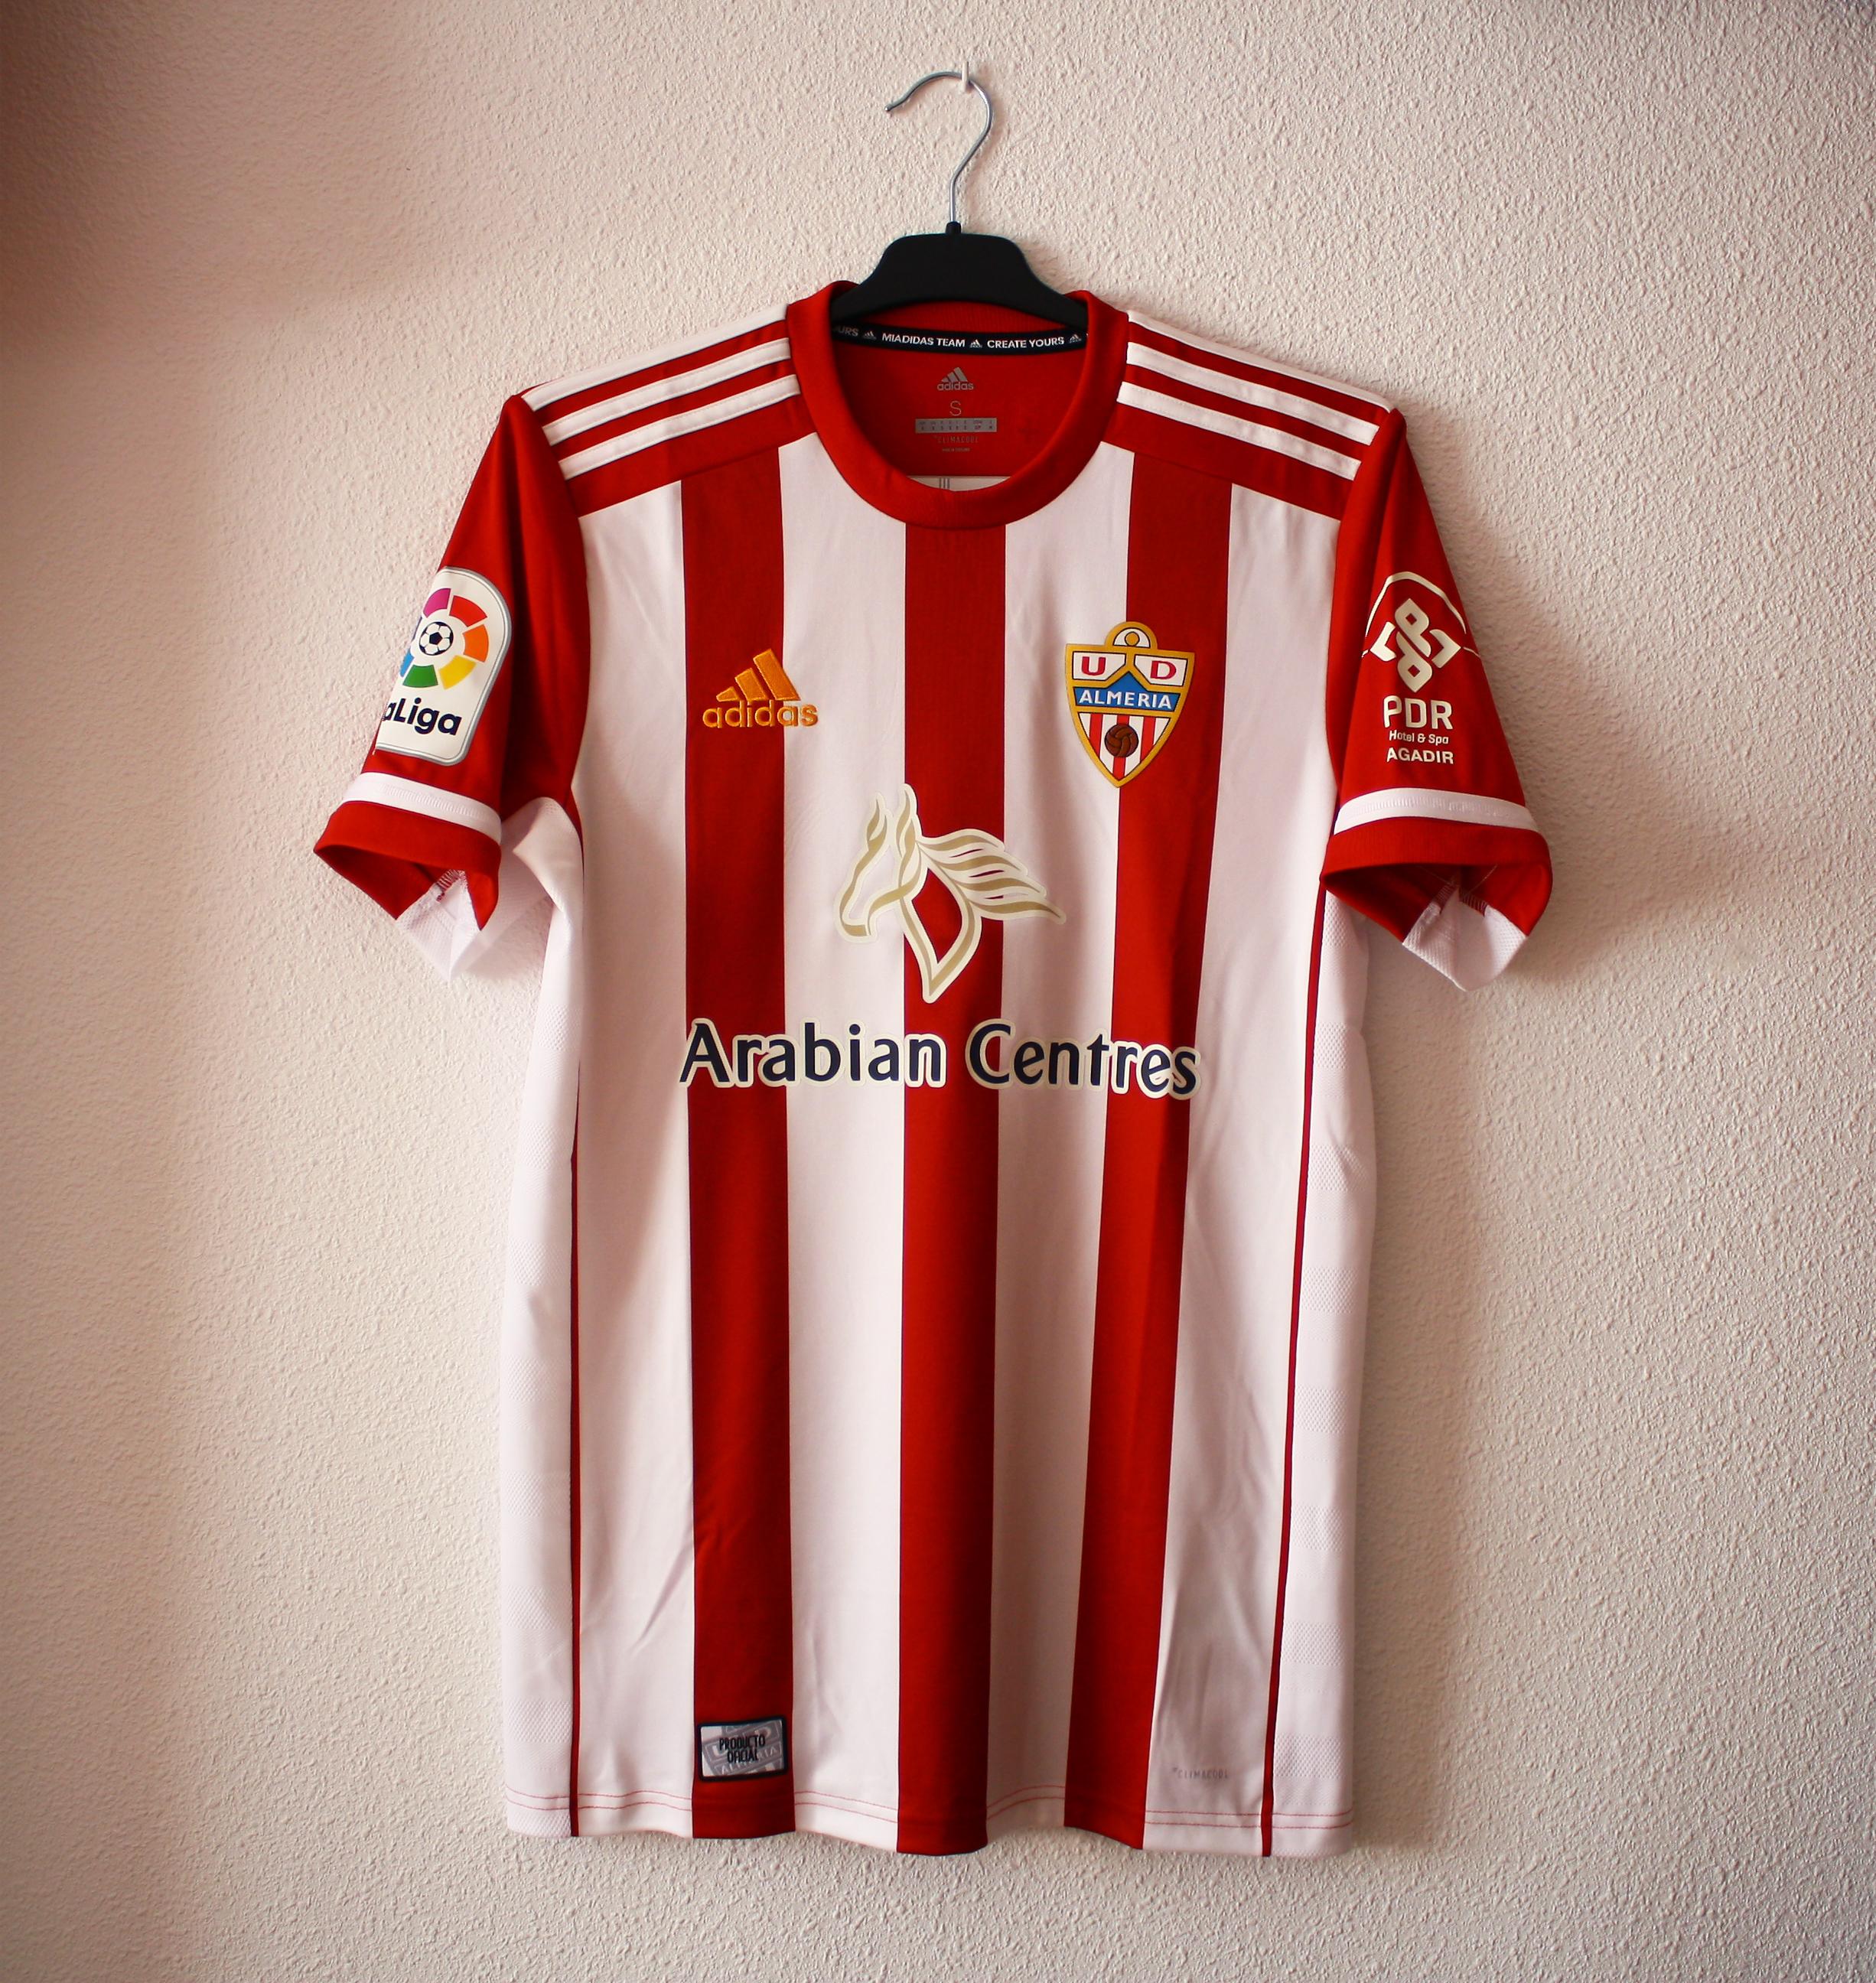 canal Retirada Isaac  File:Camiseta U.D. Almería 2019-2020.jpg - Wikimedia Commons